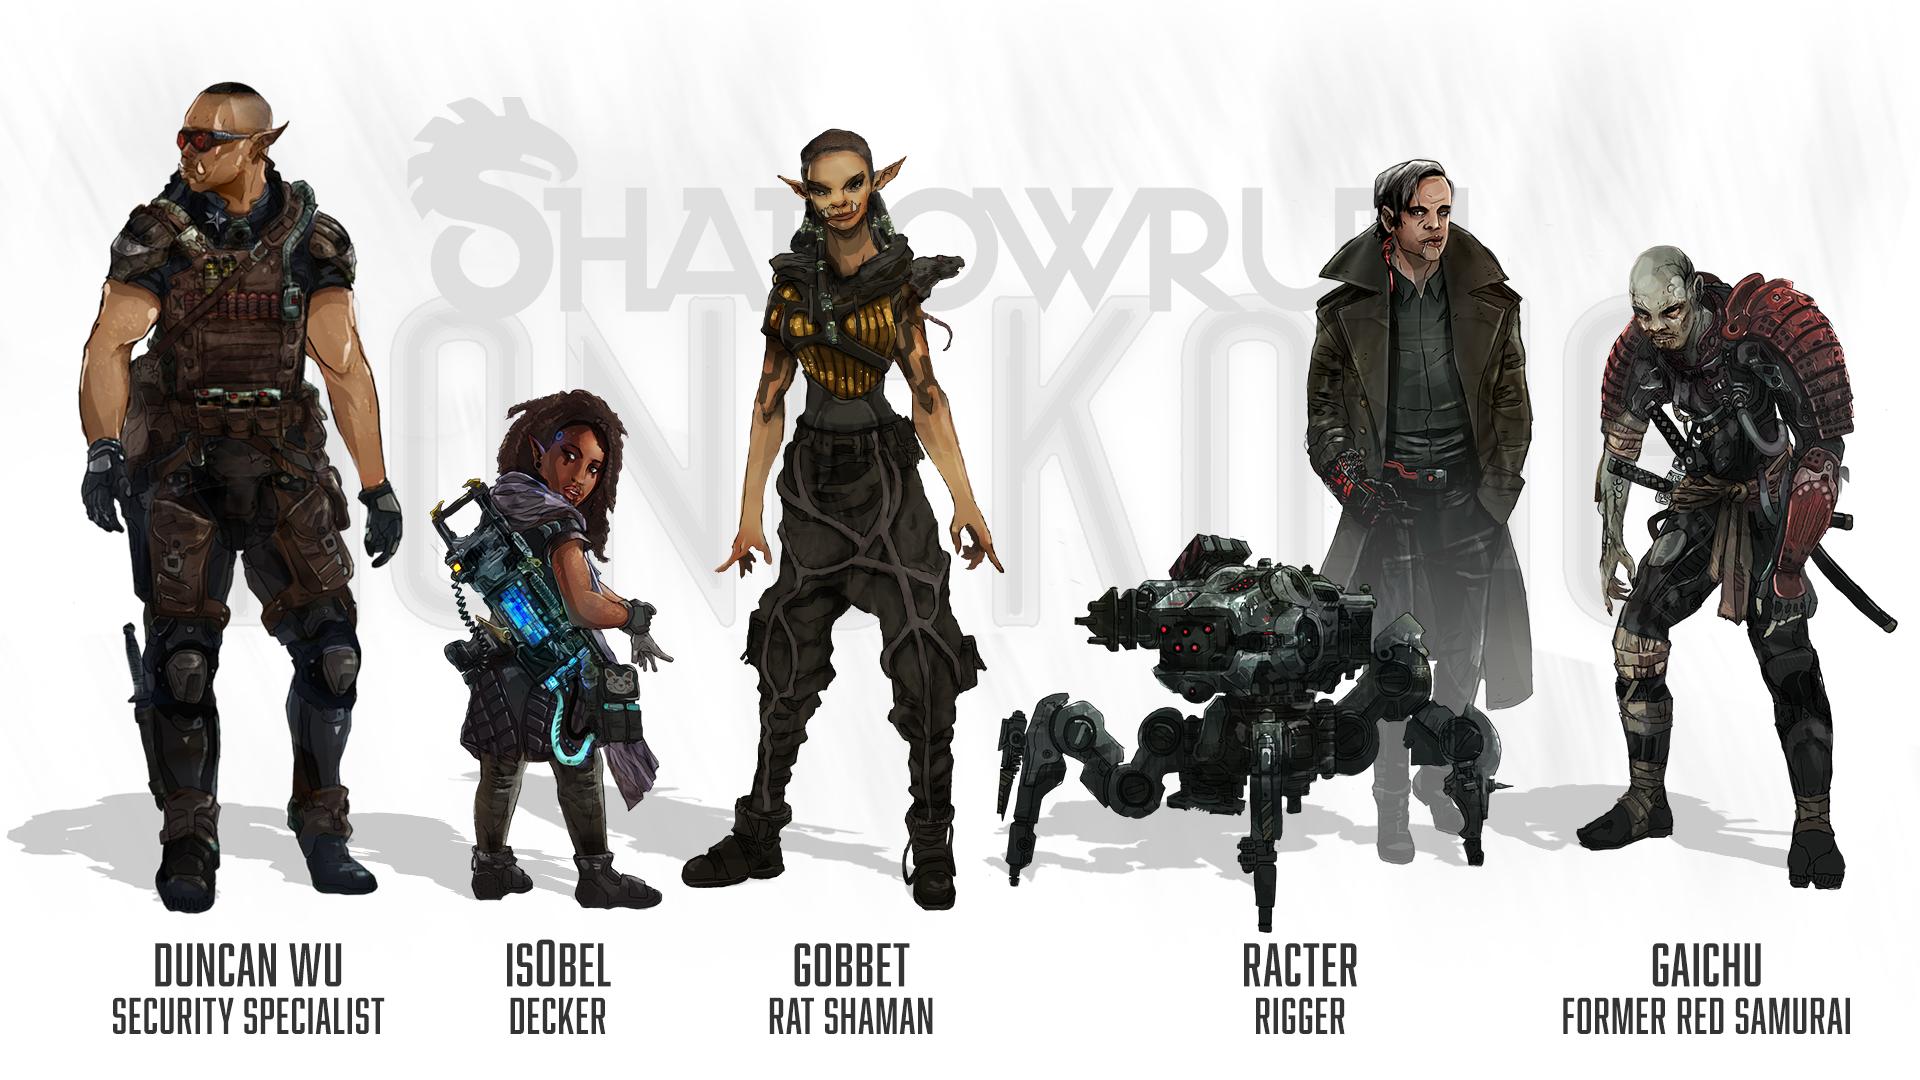 Character Design Hong Kong : Shadowrun hong kong pre release discussion